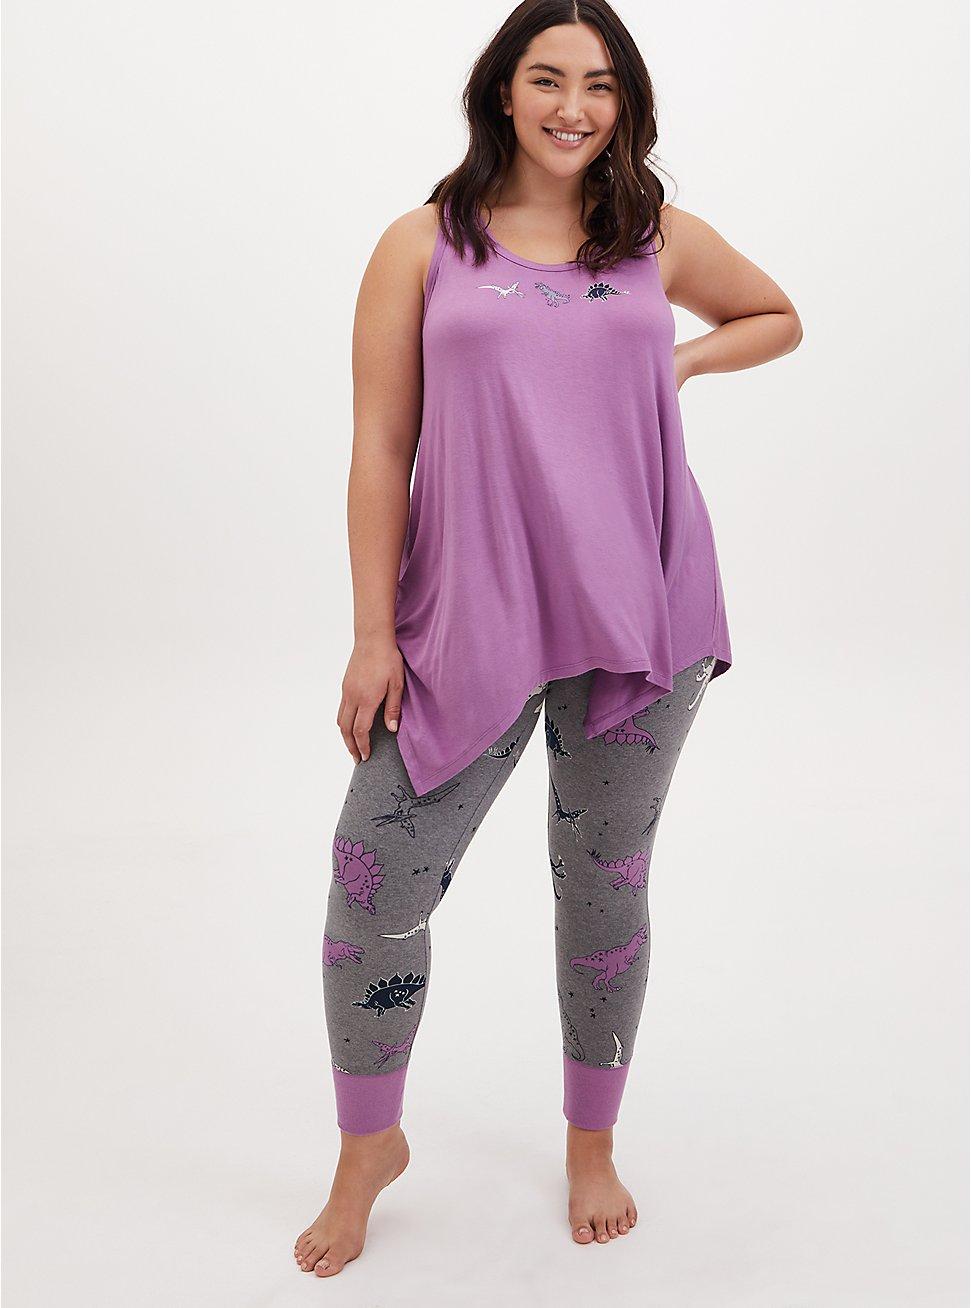 Lavender Purple & Grey Dinosaur Drawstring Sleep Pant, MULTI, hi-res